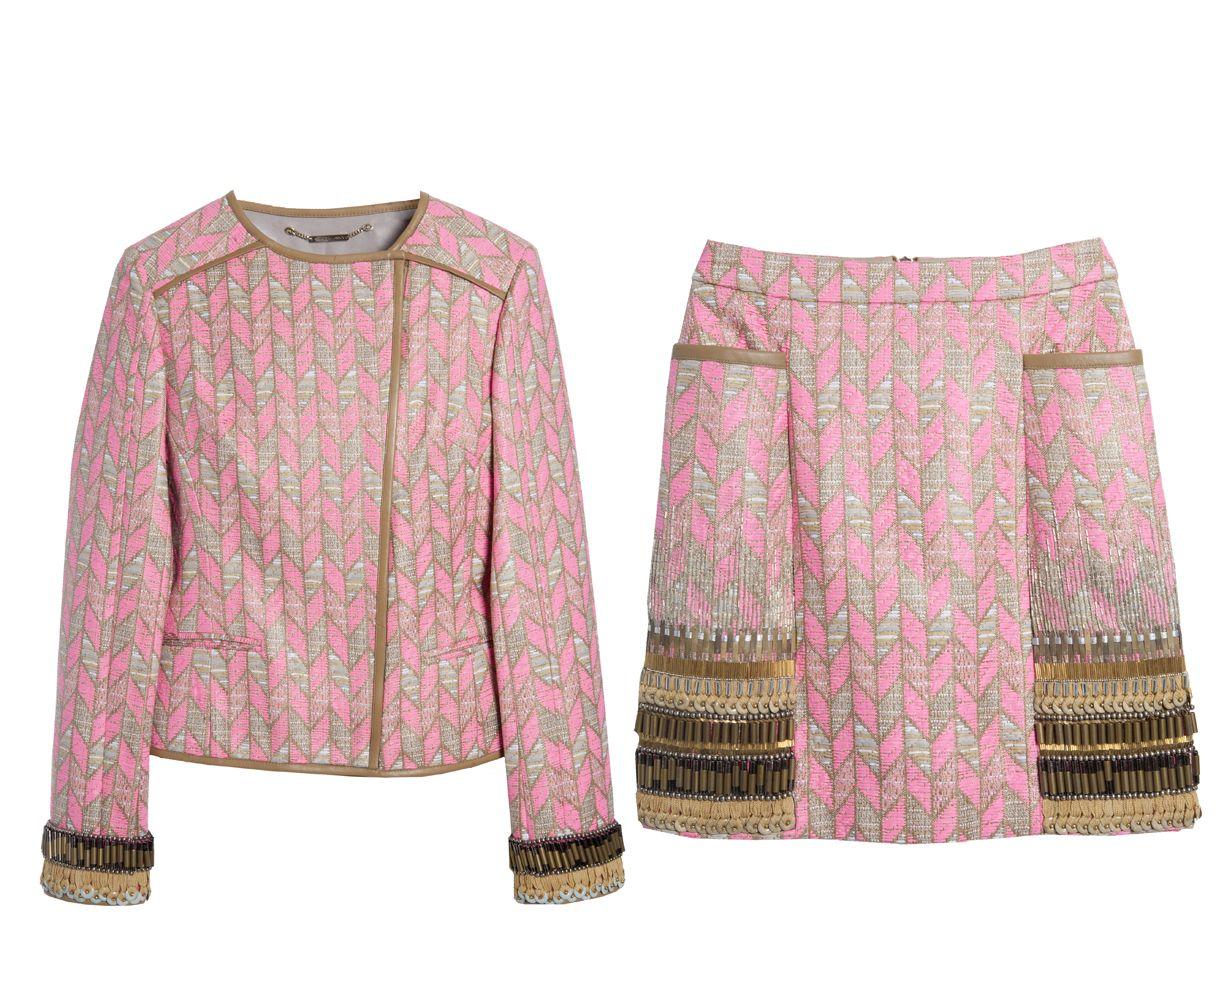 Matthew Williamson Embroidered Mini Skirt and Jacket @ 25Park.com